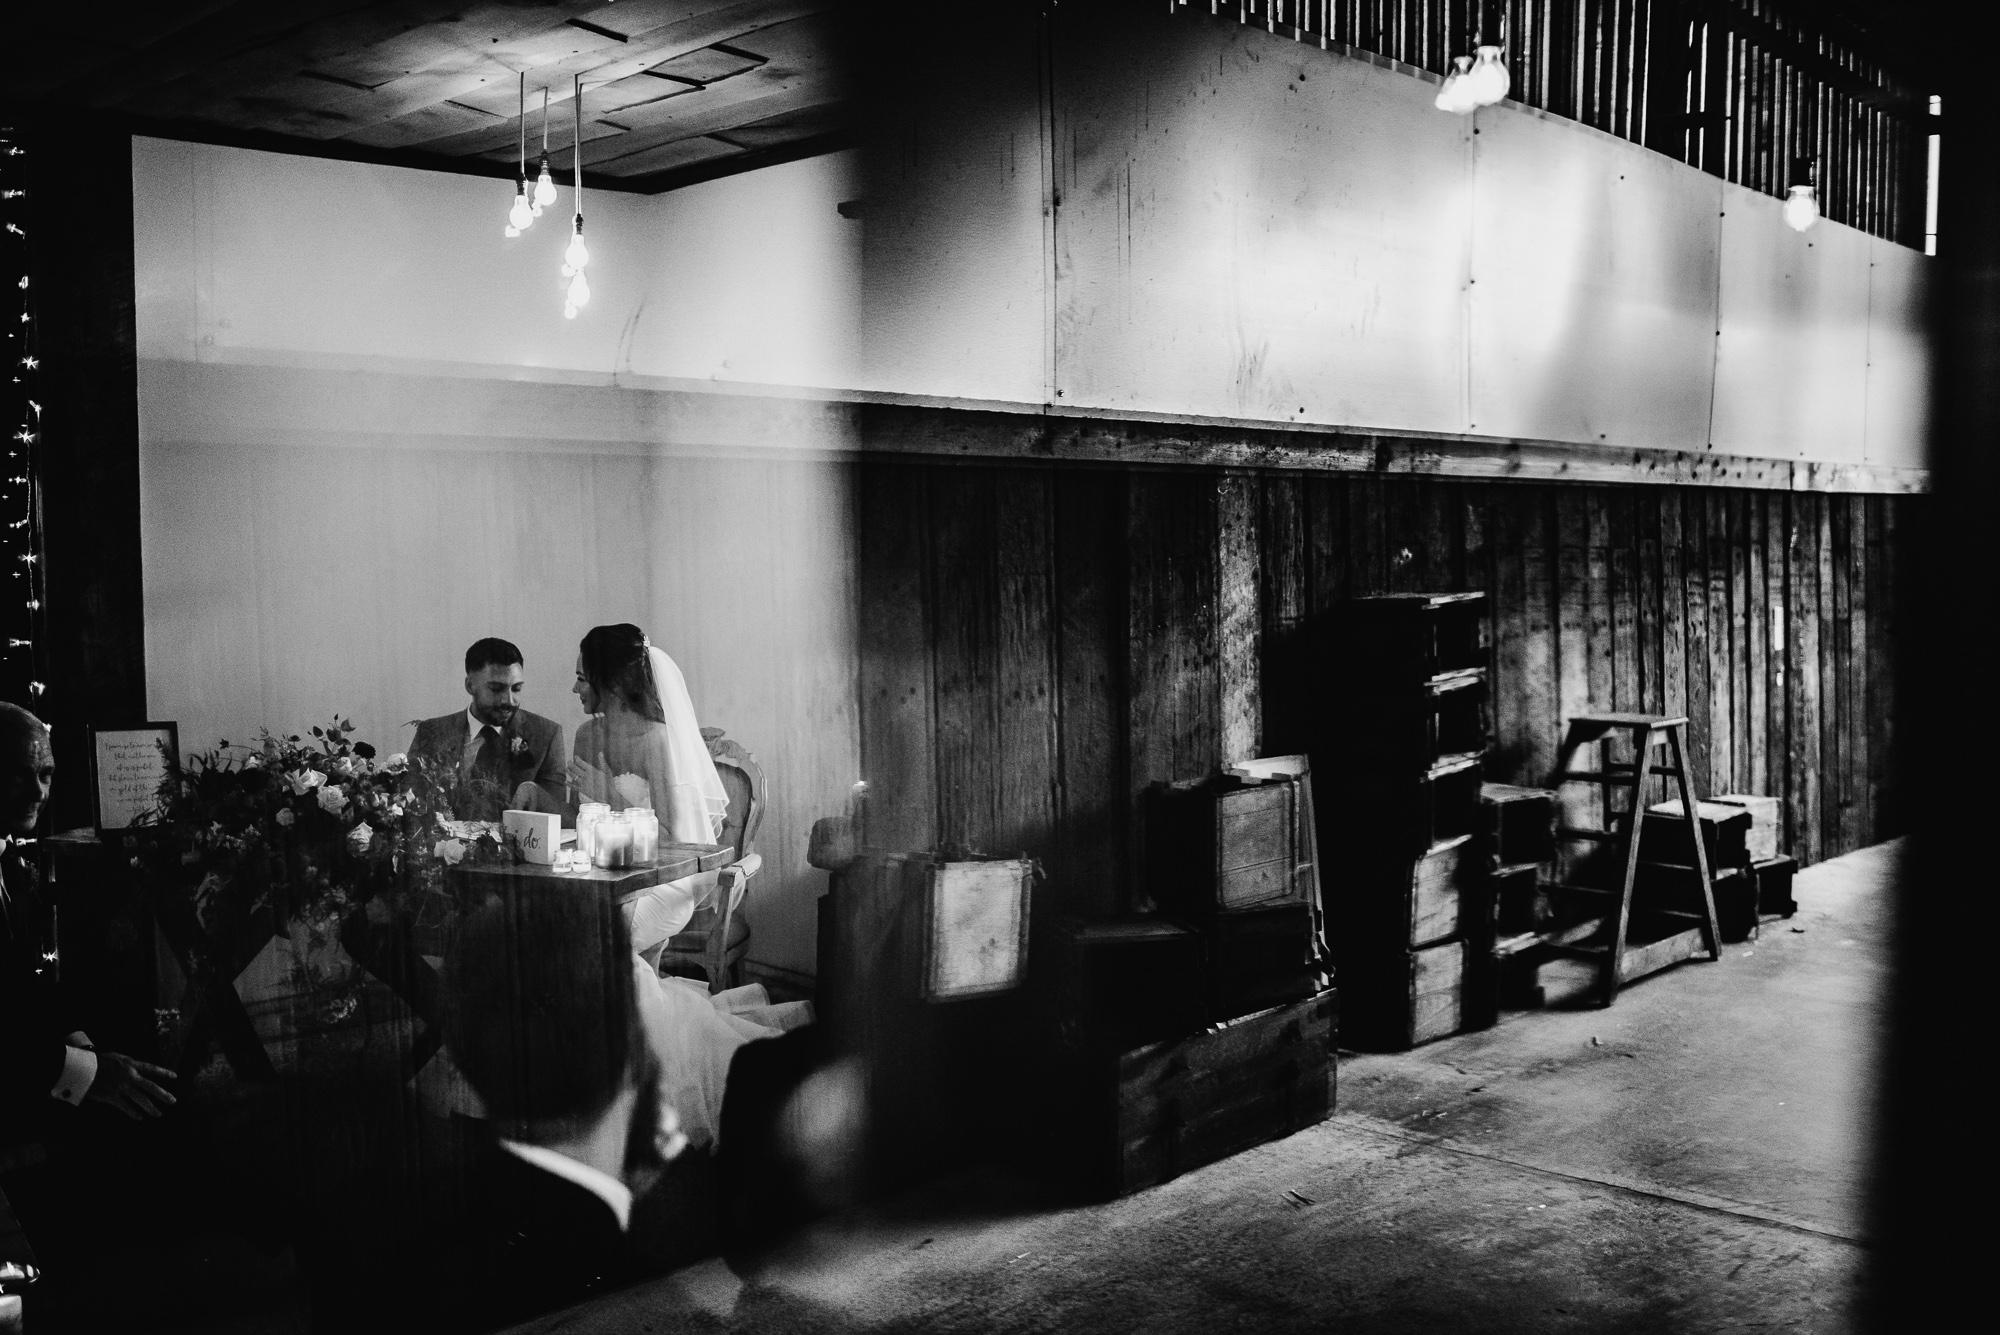 Owen house wedding barn wedding photographer north west cheshire england (25 of 38).jpg